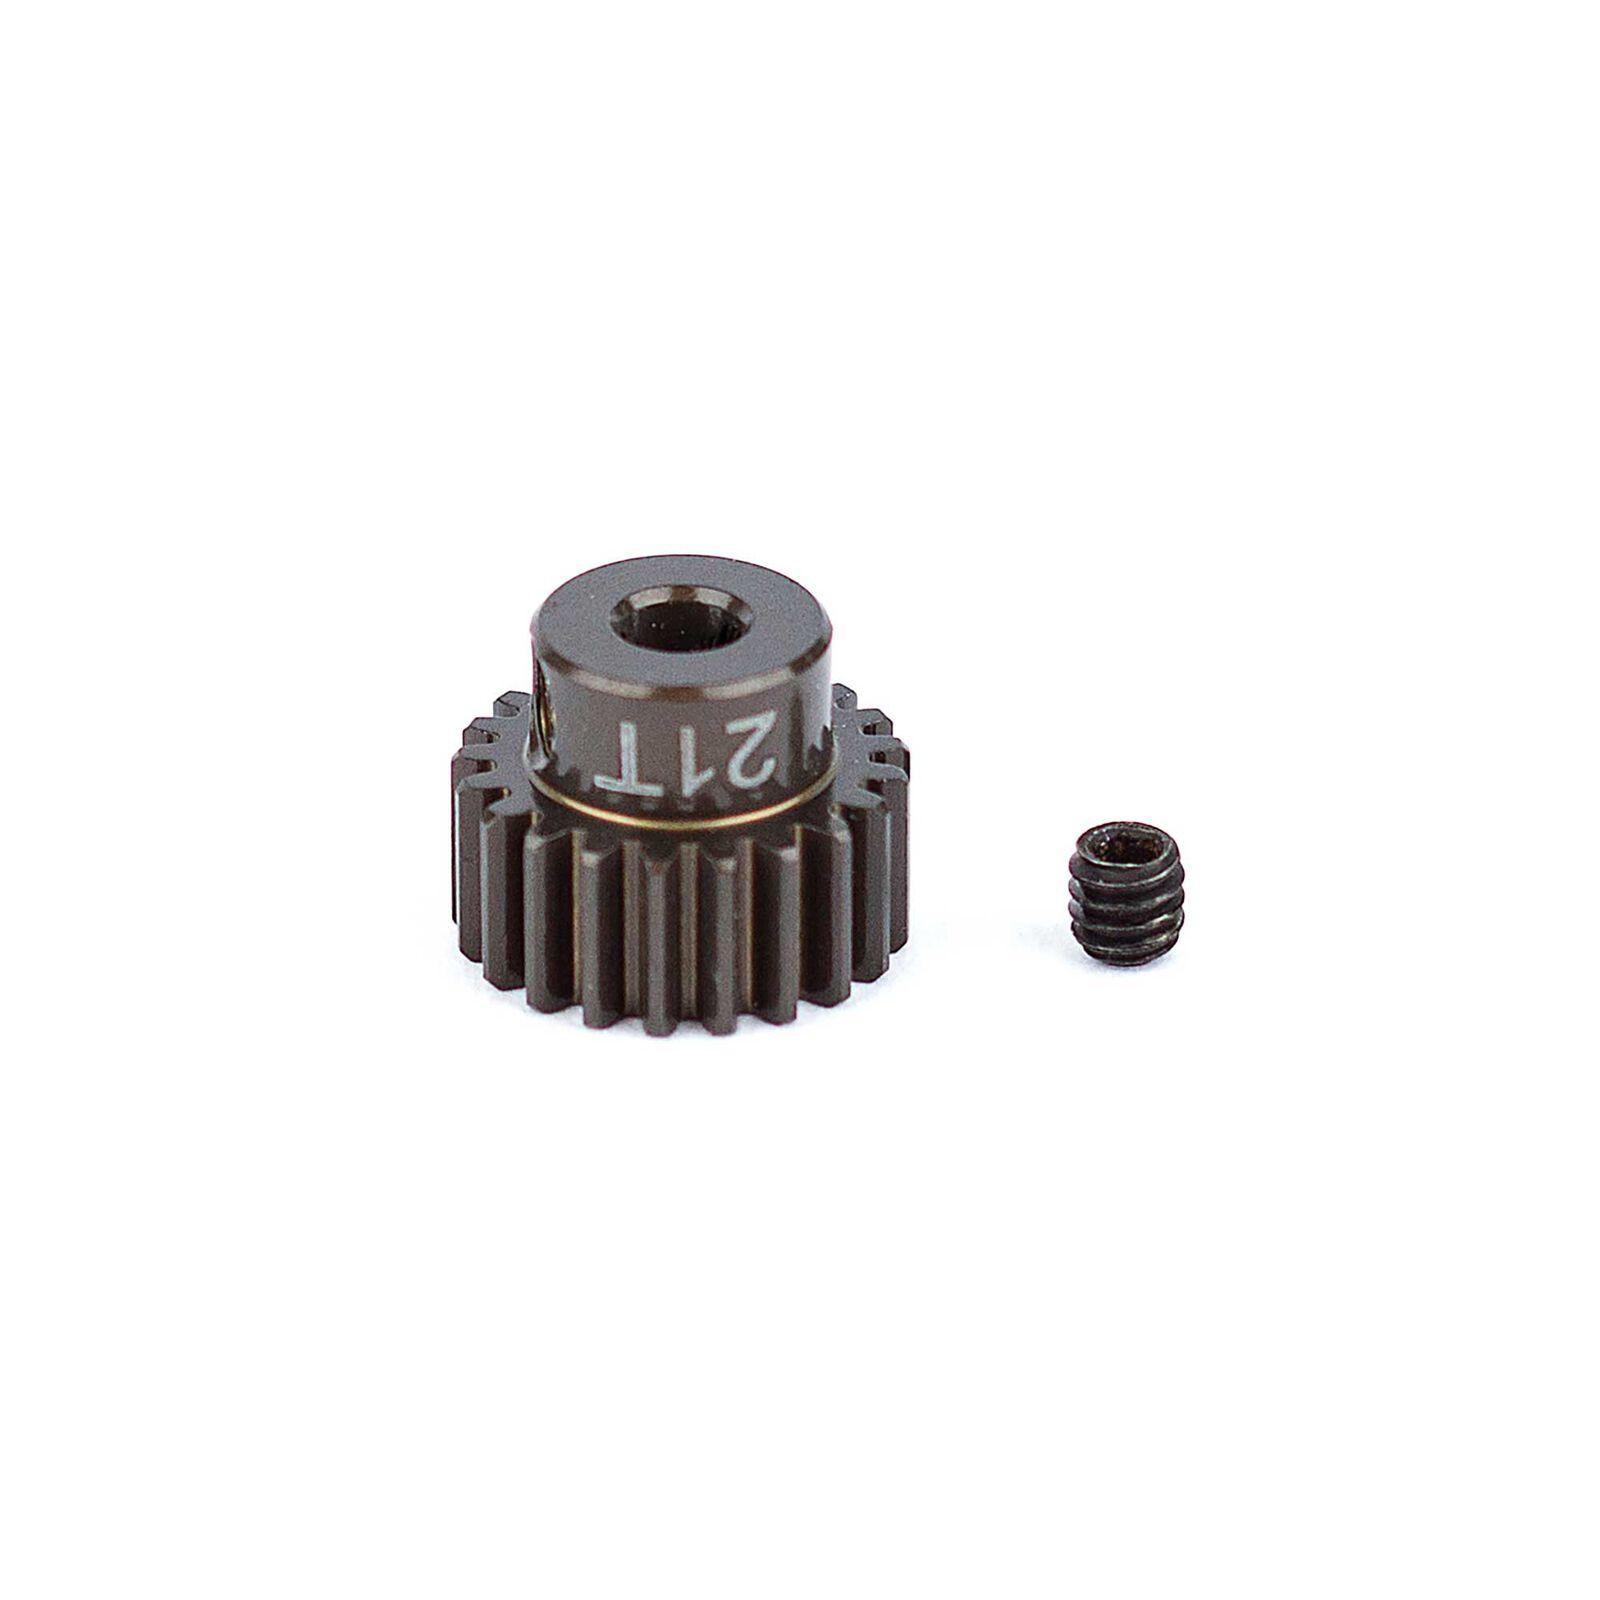 Factory Team Aluminum Pinion Gear, 21T, 48P, 1/8 shaft